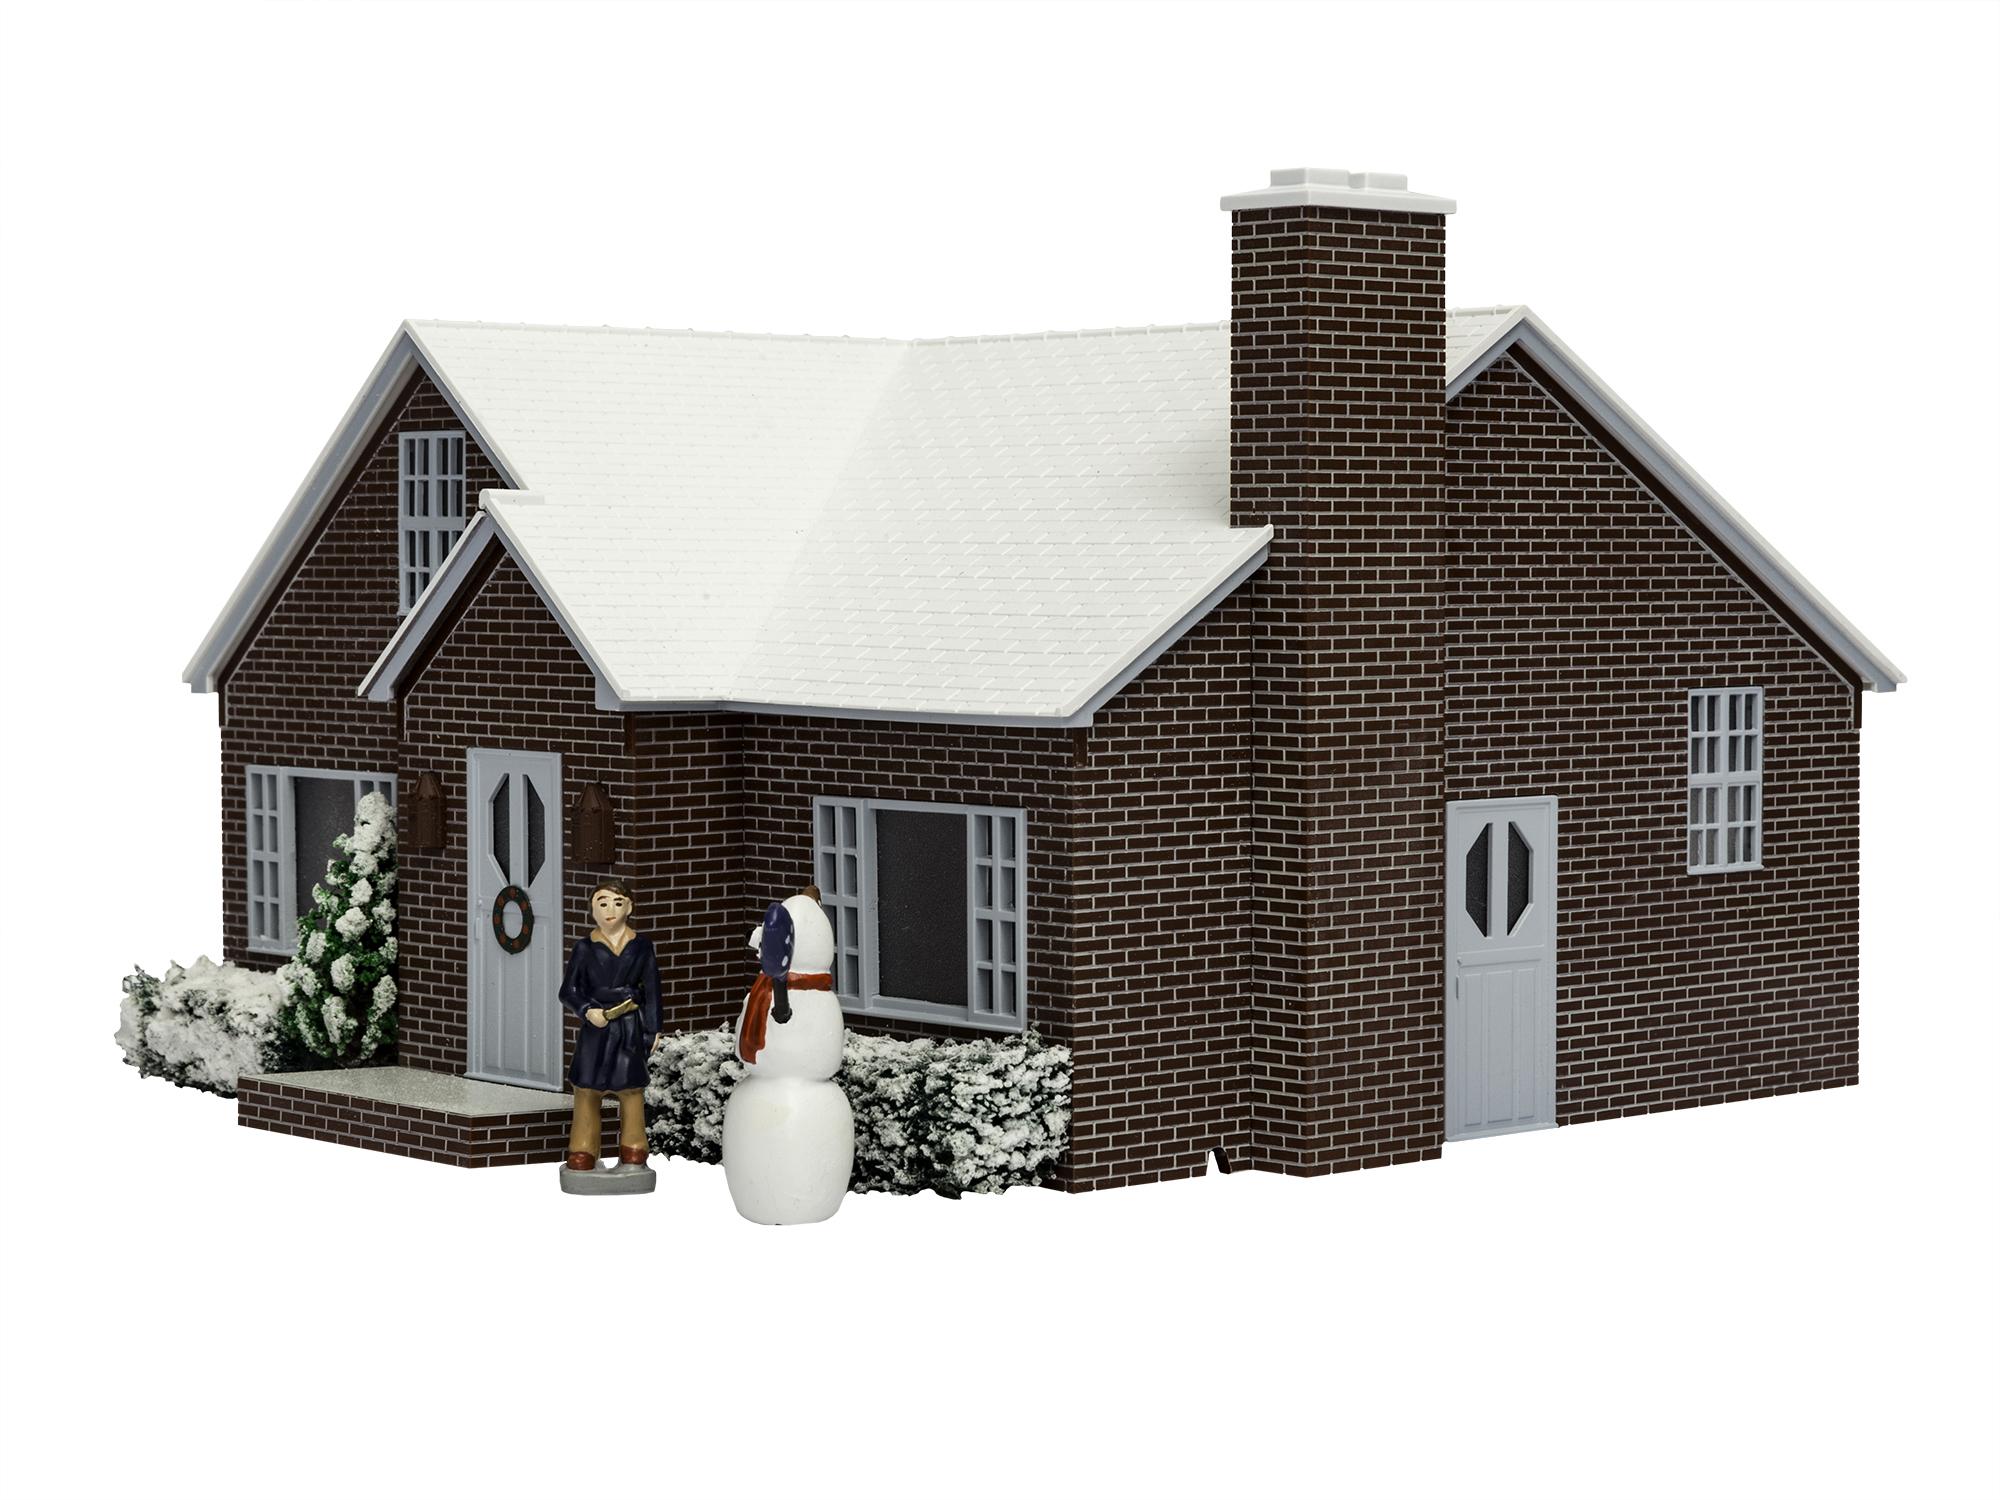 LNL685410 Lionel O Hero Boy's House, The Polar Express